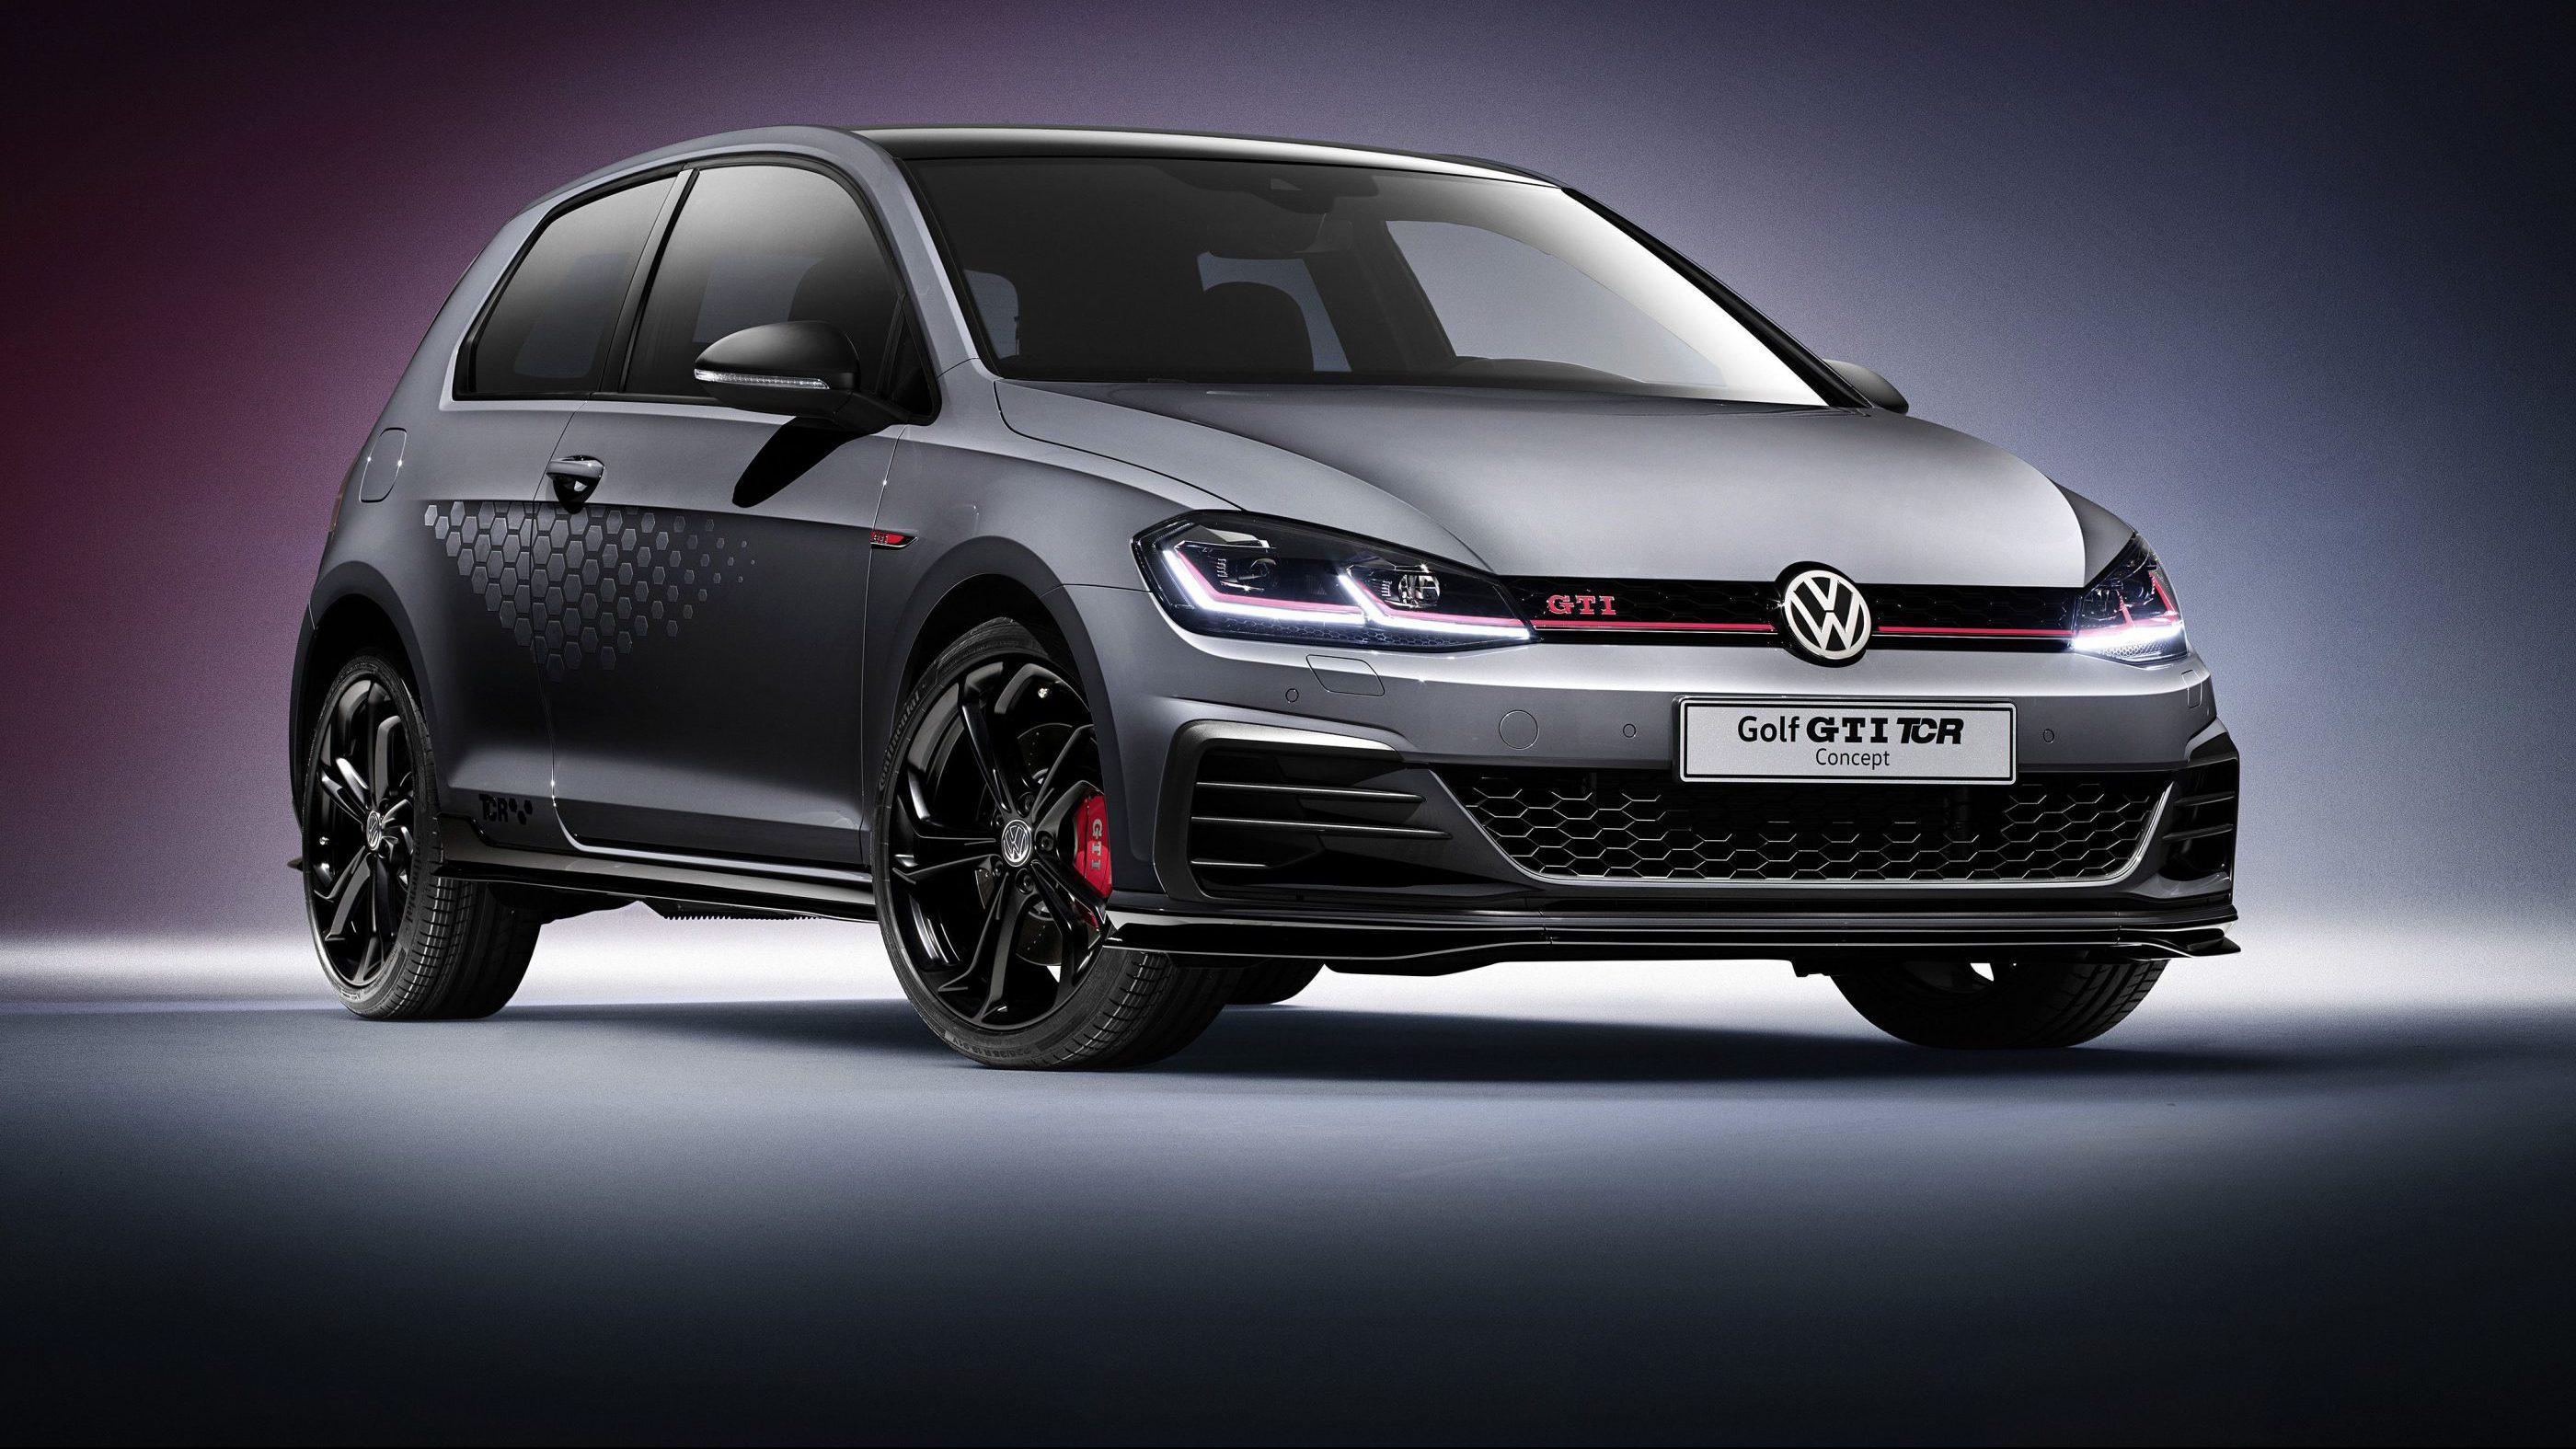 VW Golf GTI TCR Concept neu